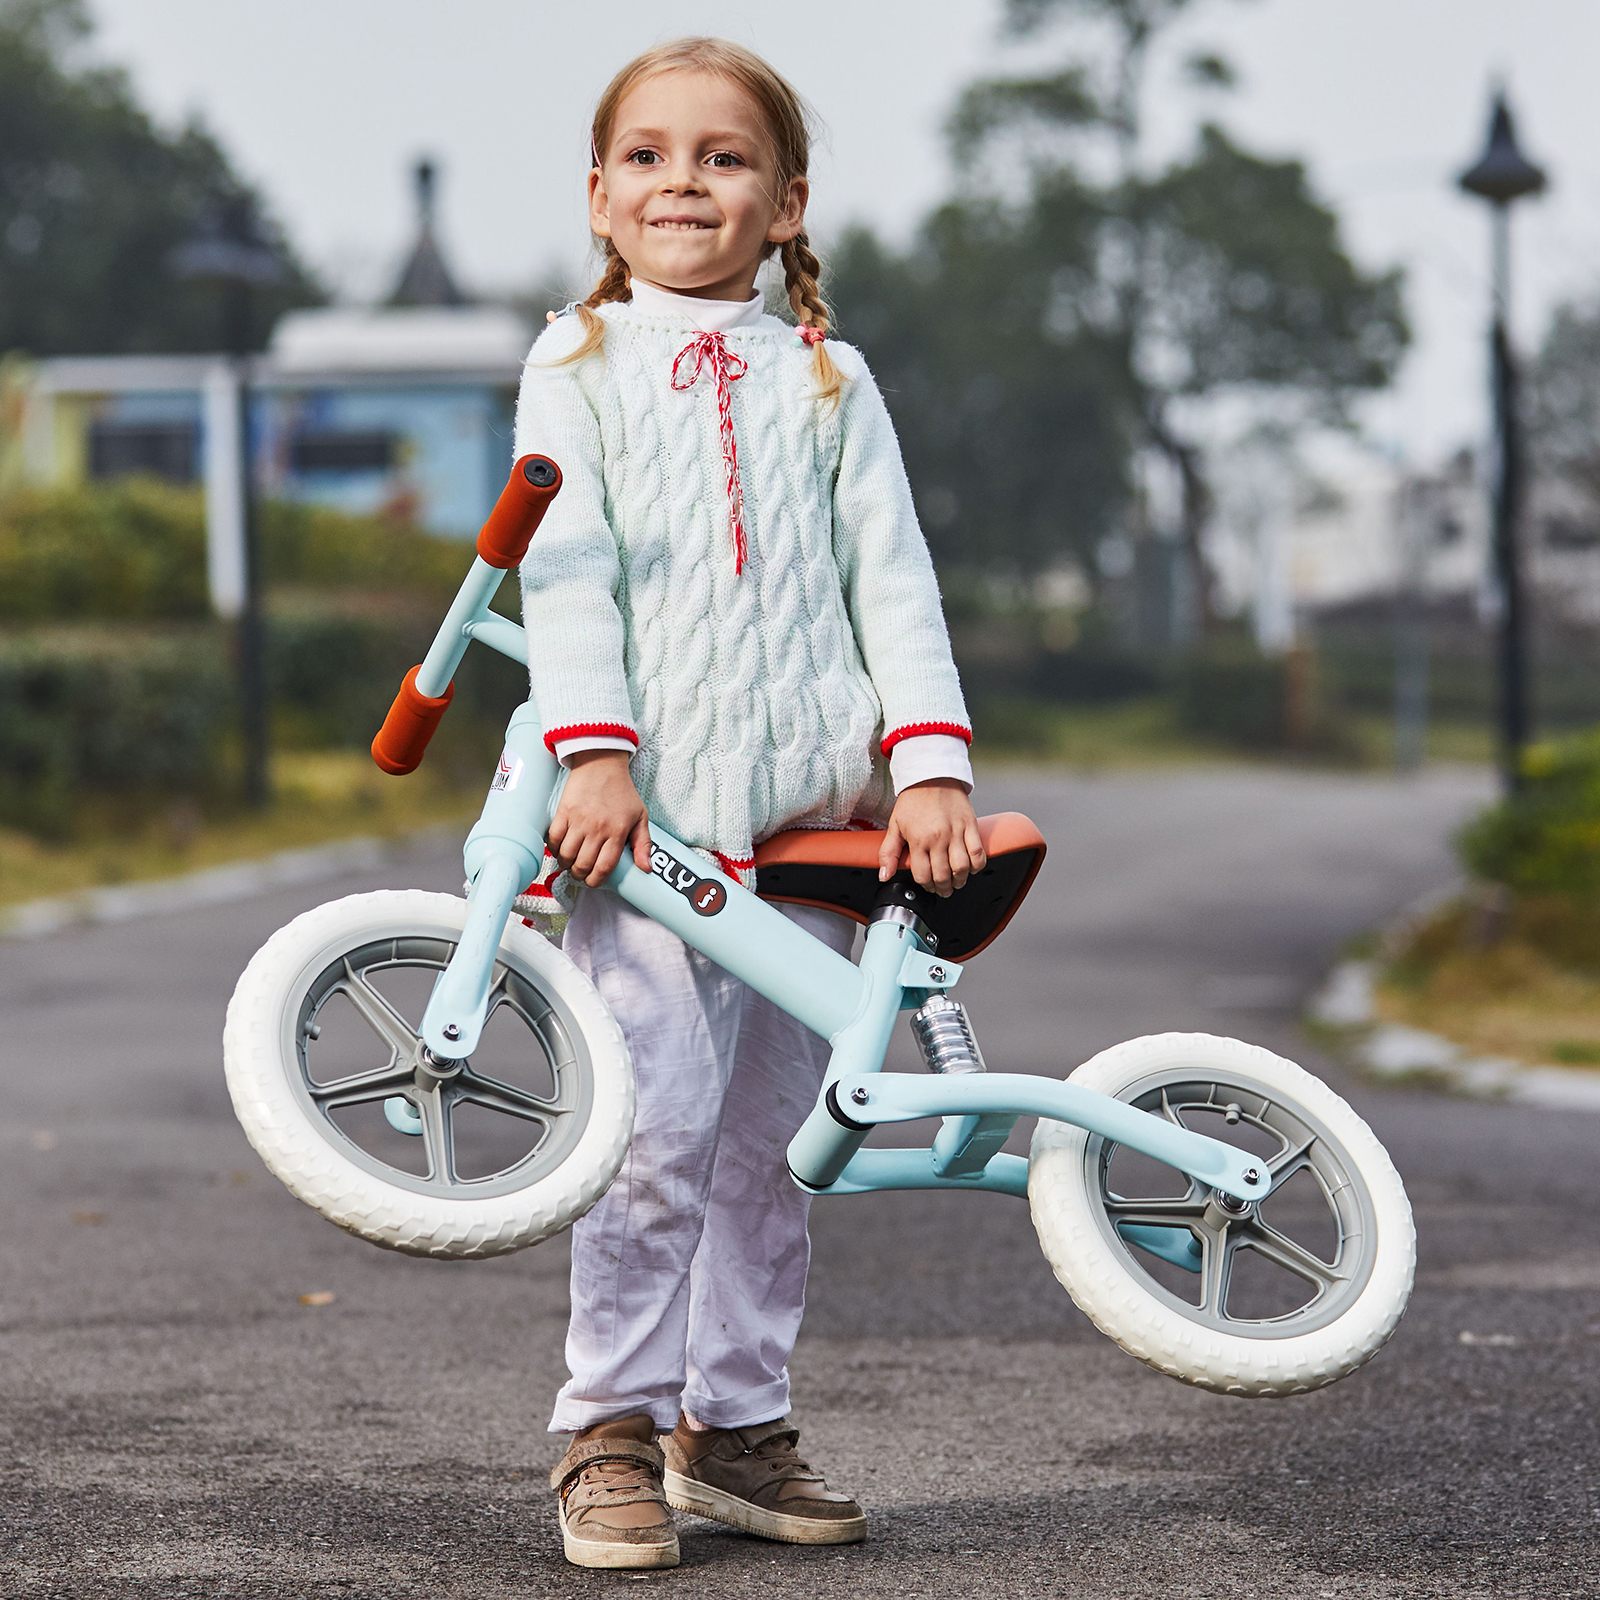 Indexbild 18 - HOMCOM Laufrad mit Stoßdämpfer Kinderrad Lauflernrad Balance Bike 2-5 Jahre